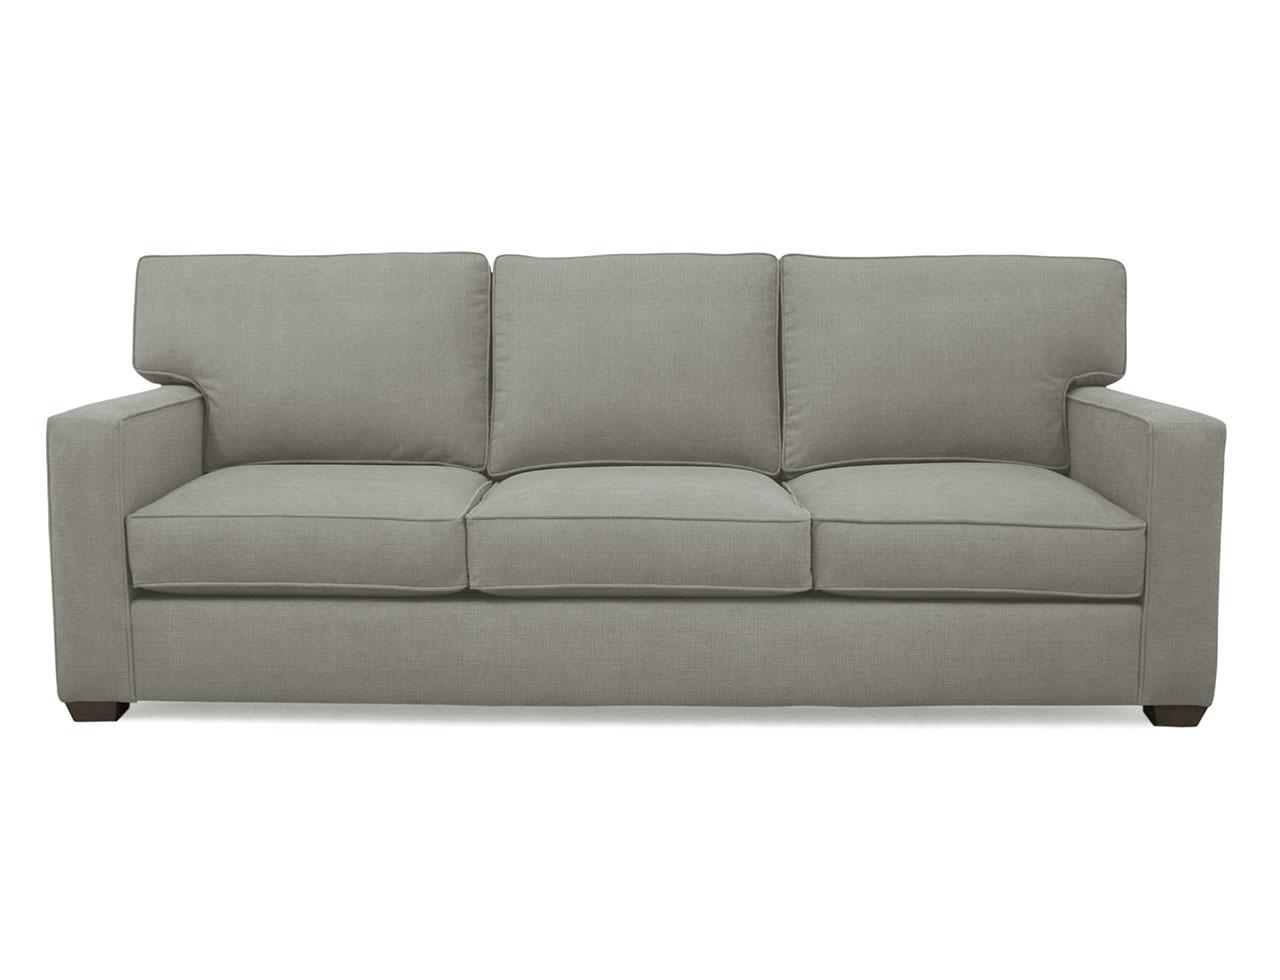 stain proof sofa fabric monaco rattan garden furniture semi circle set hugo - crypton store